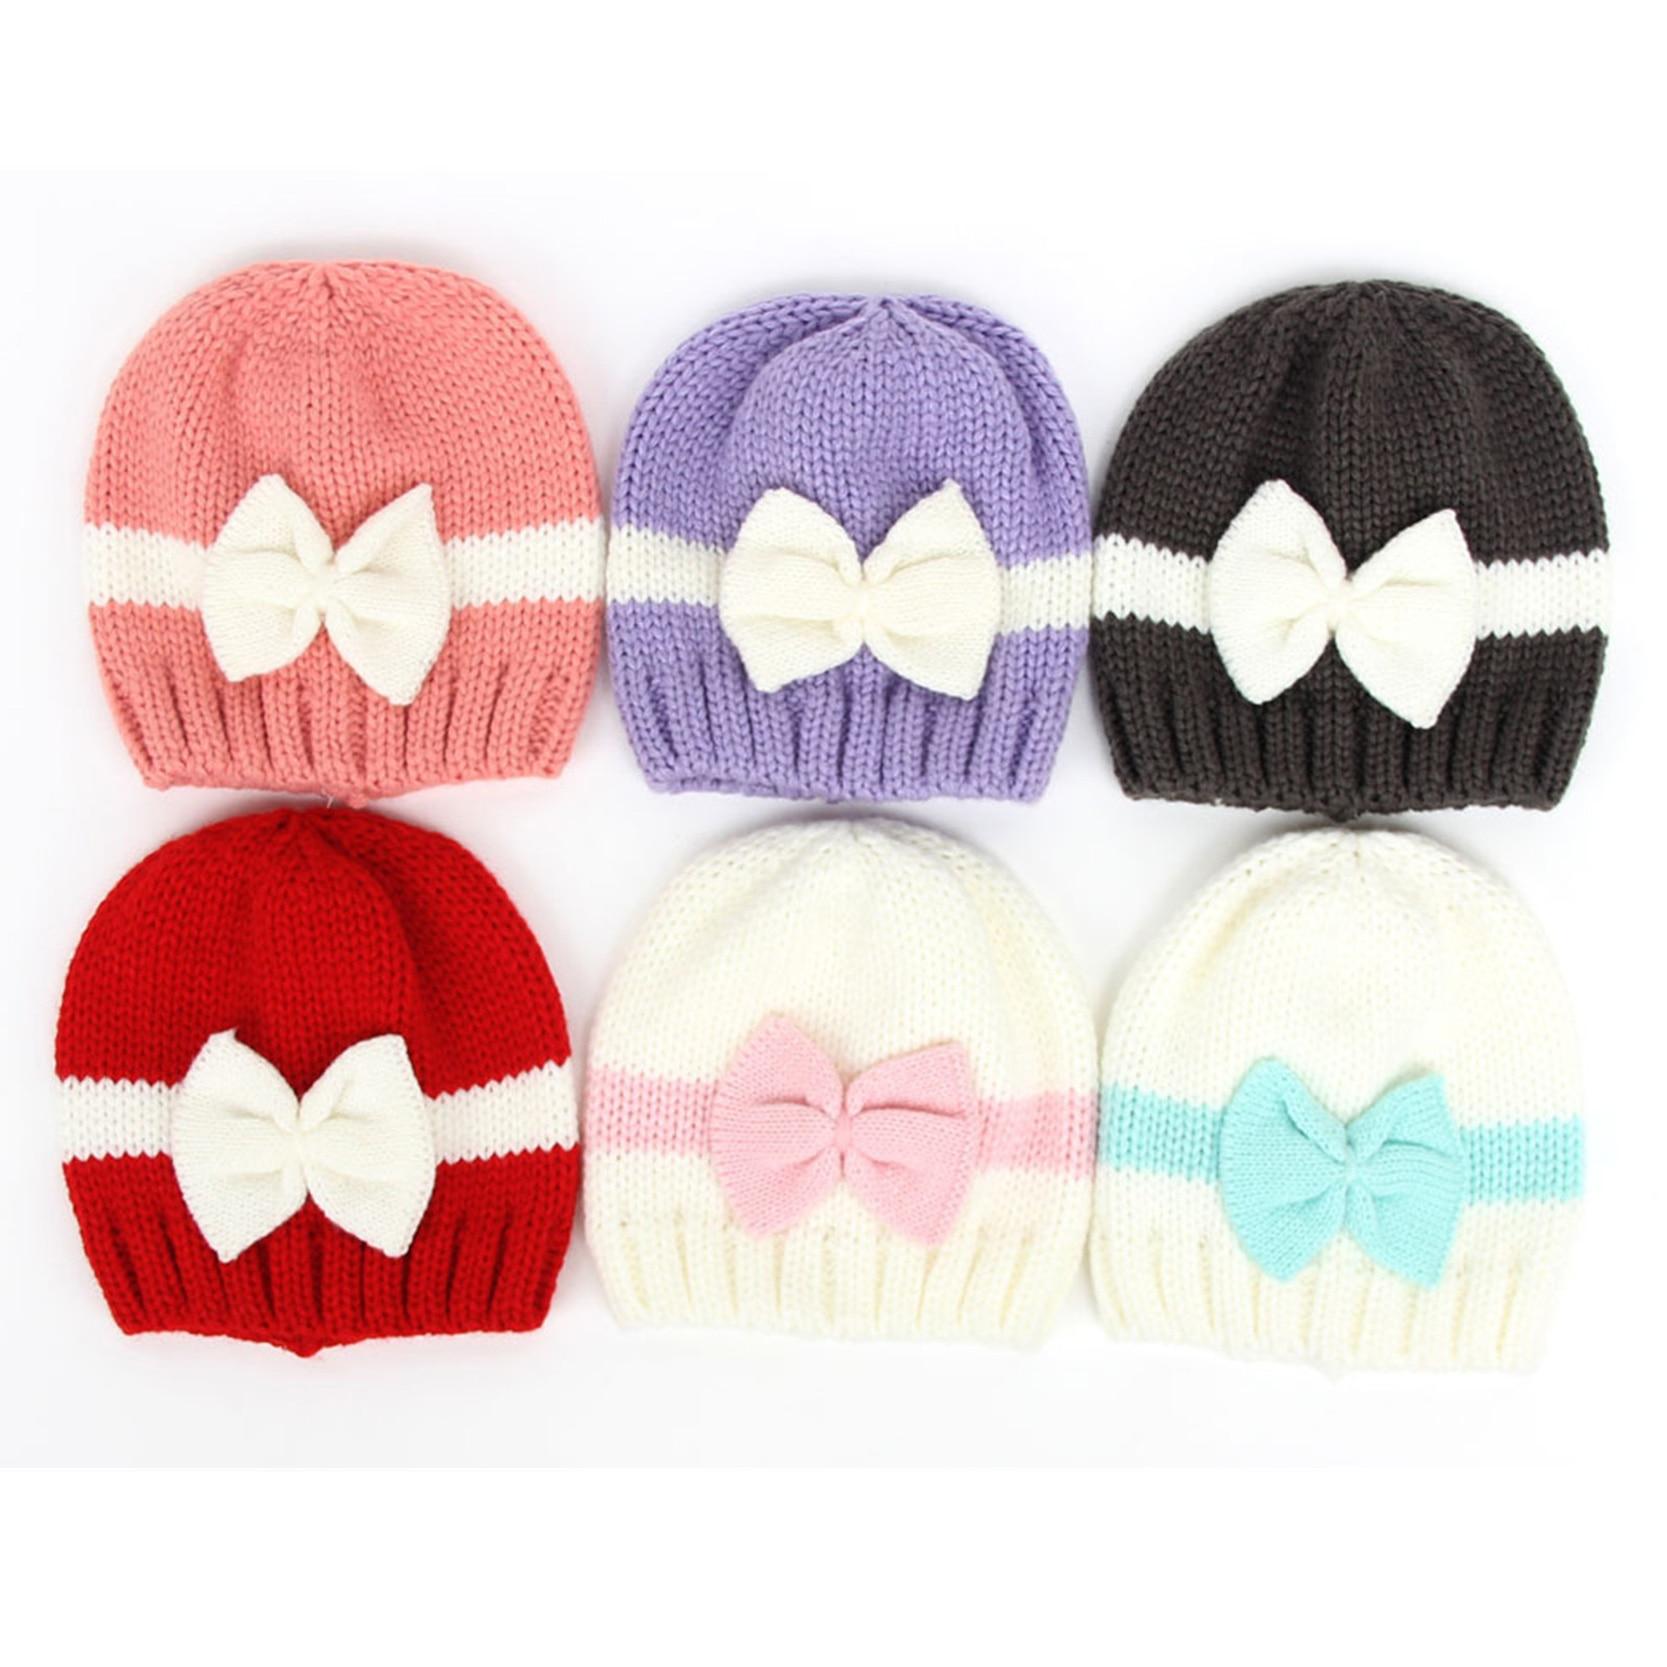 5f3079e9 New Cute Newborn Baby Knitting Hat Bow Knot Cap Infant Girl Winter Warm  Beanie